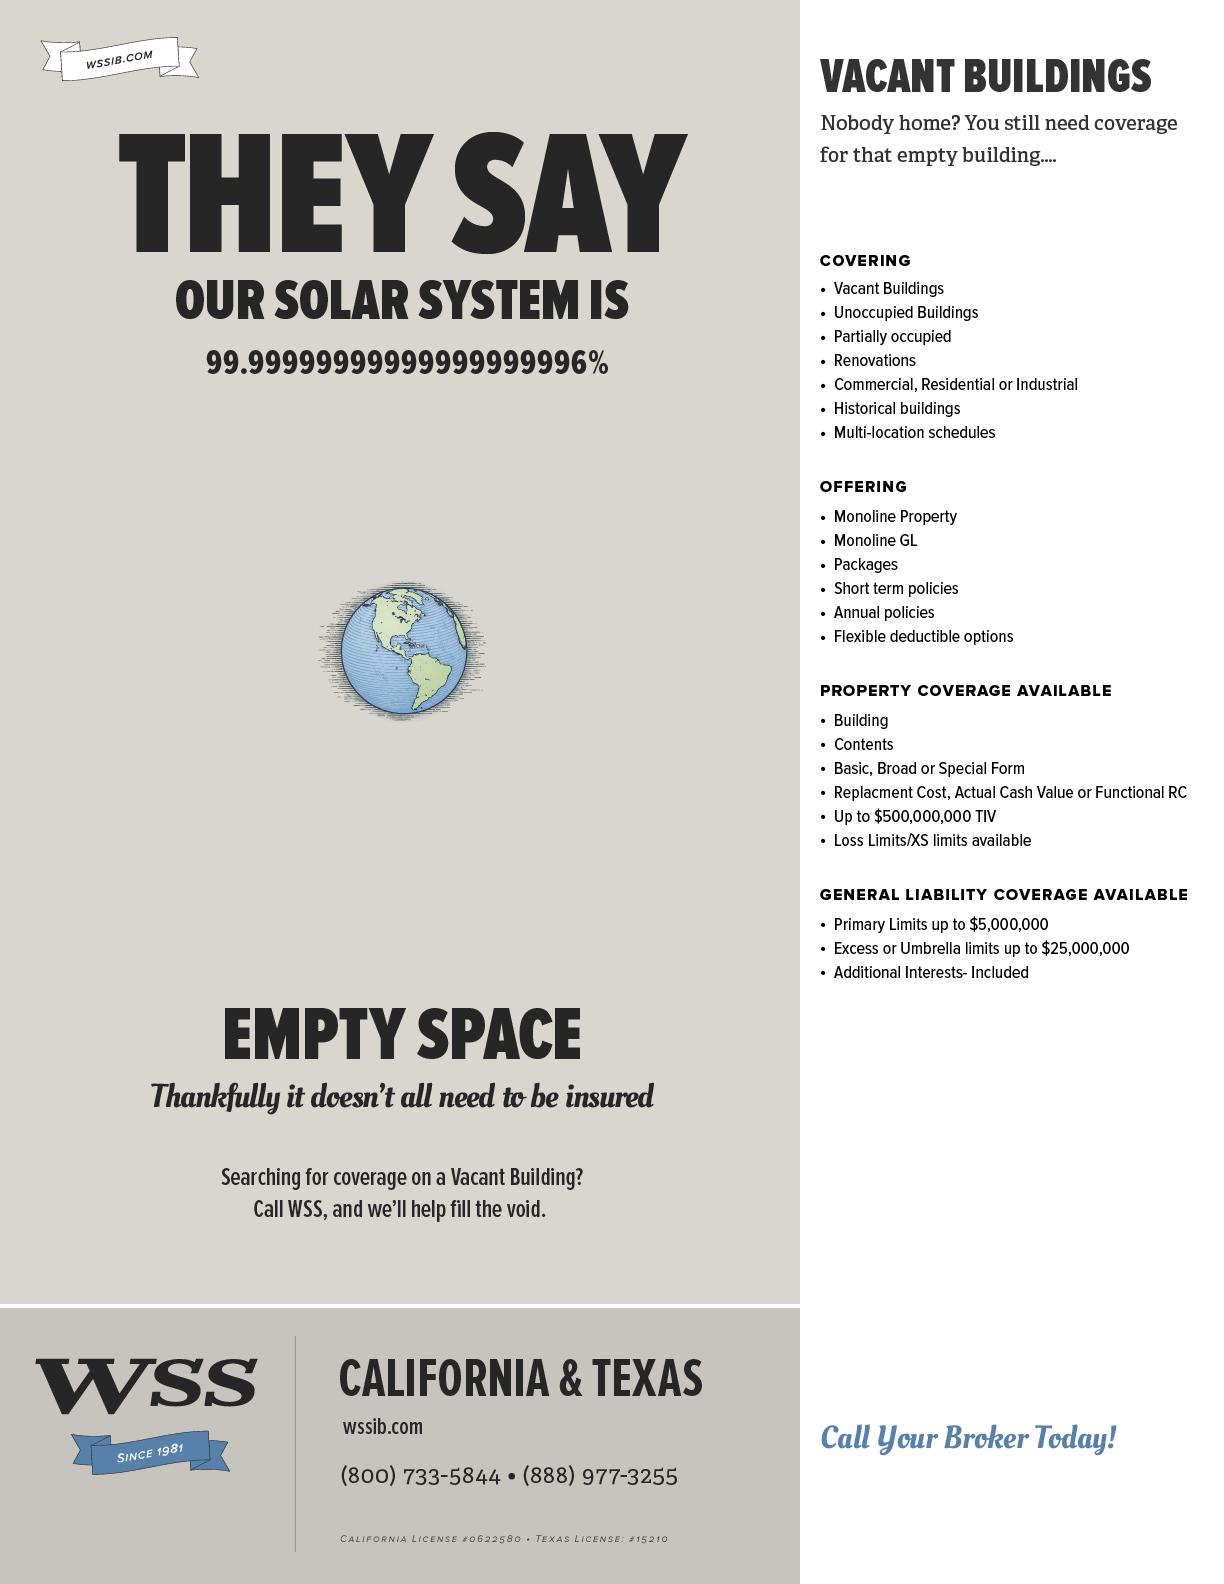 WSS-Flyer-VacantBuilding.png